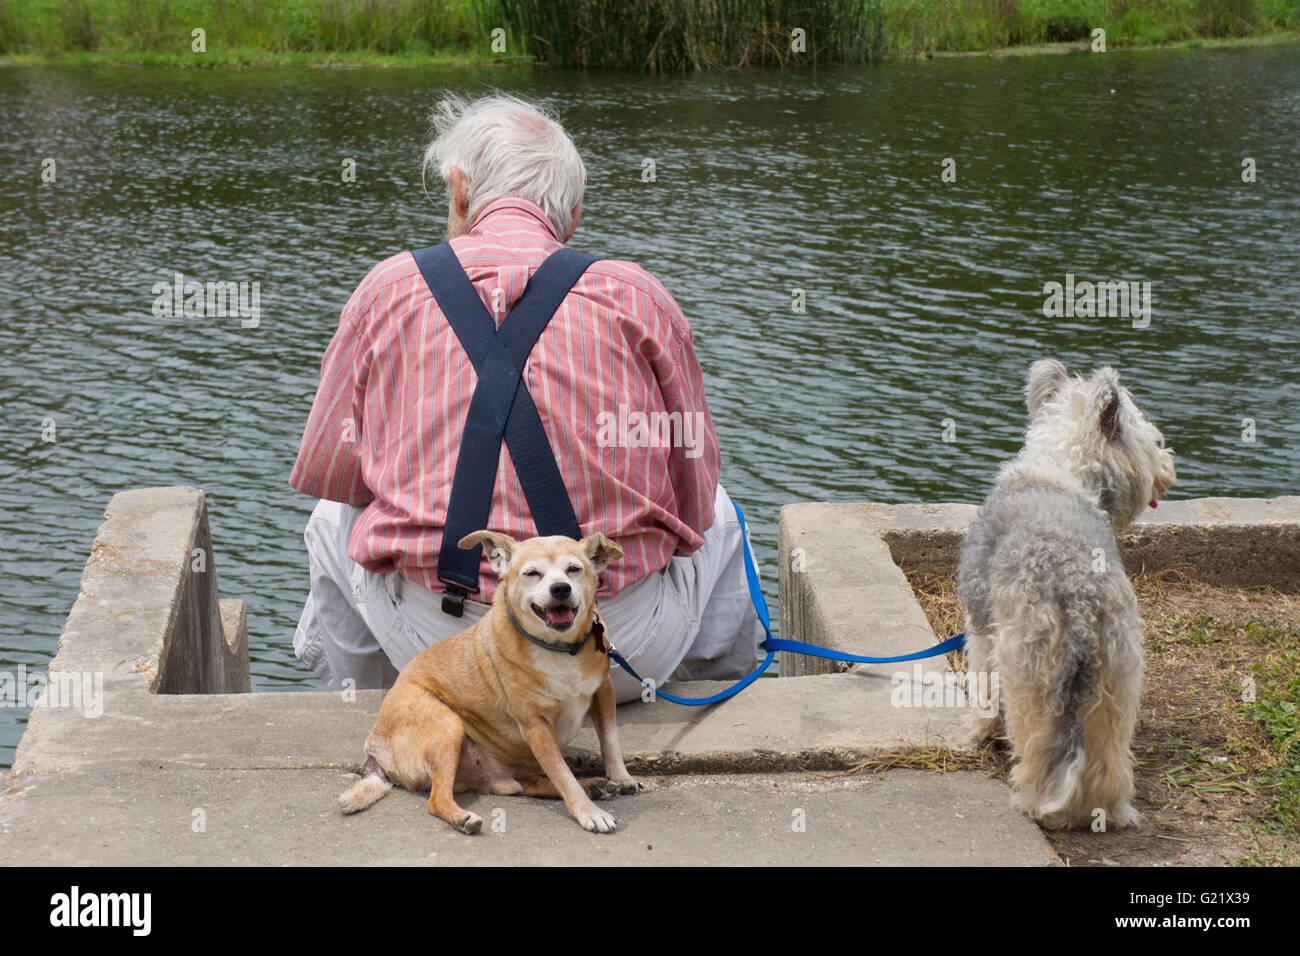 Älterer Mann das Wasser mit seinen zwei Hunden zu betrachten. Stockbild